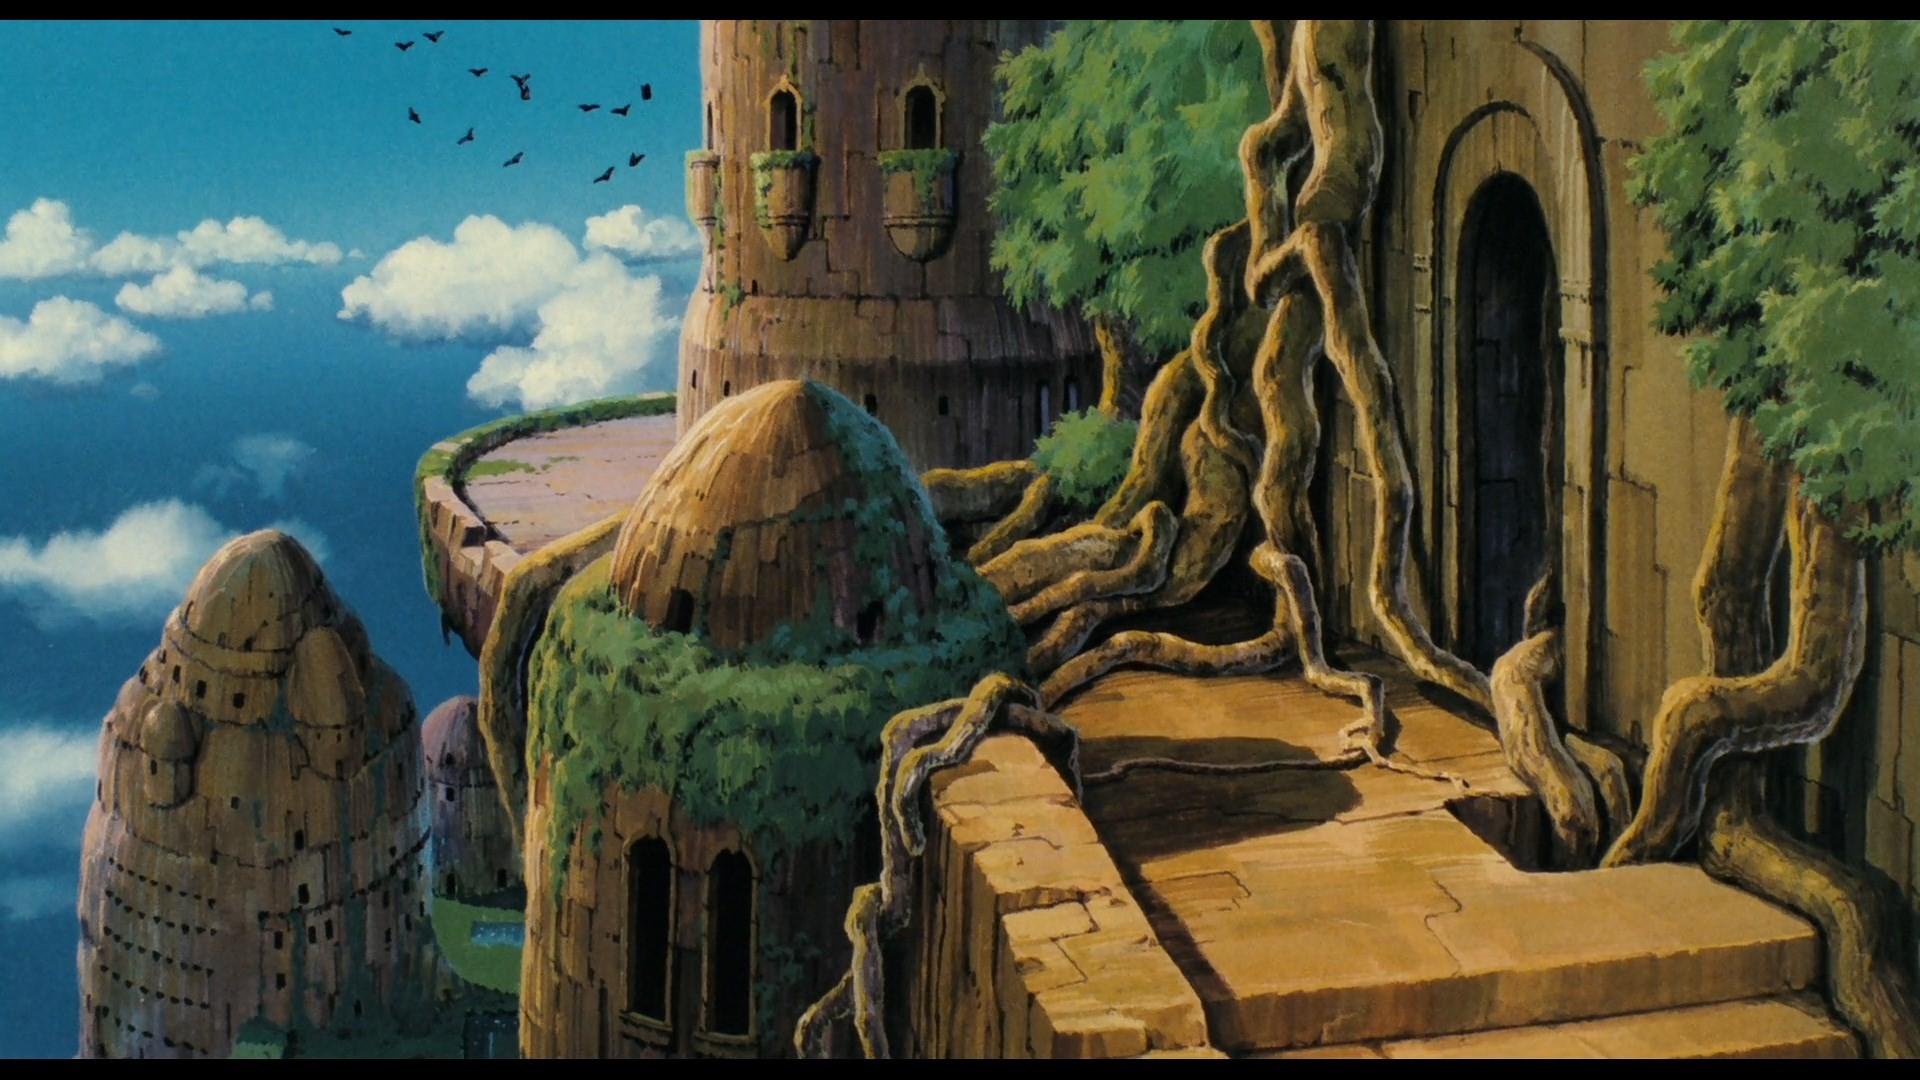 laputa castle in the sky wallpaper for mac computers by Sherlock Allford  (2017-03-06)